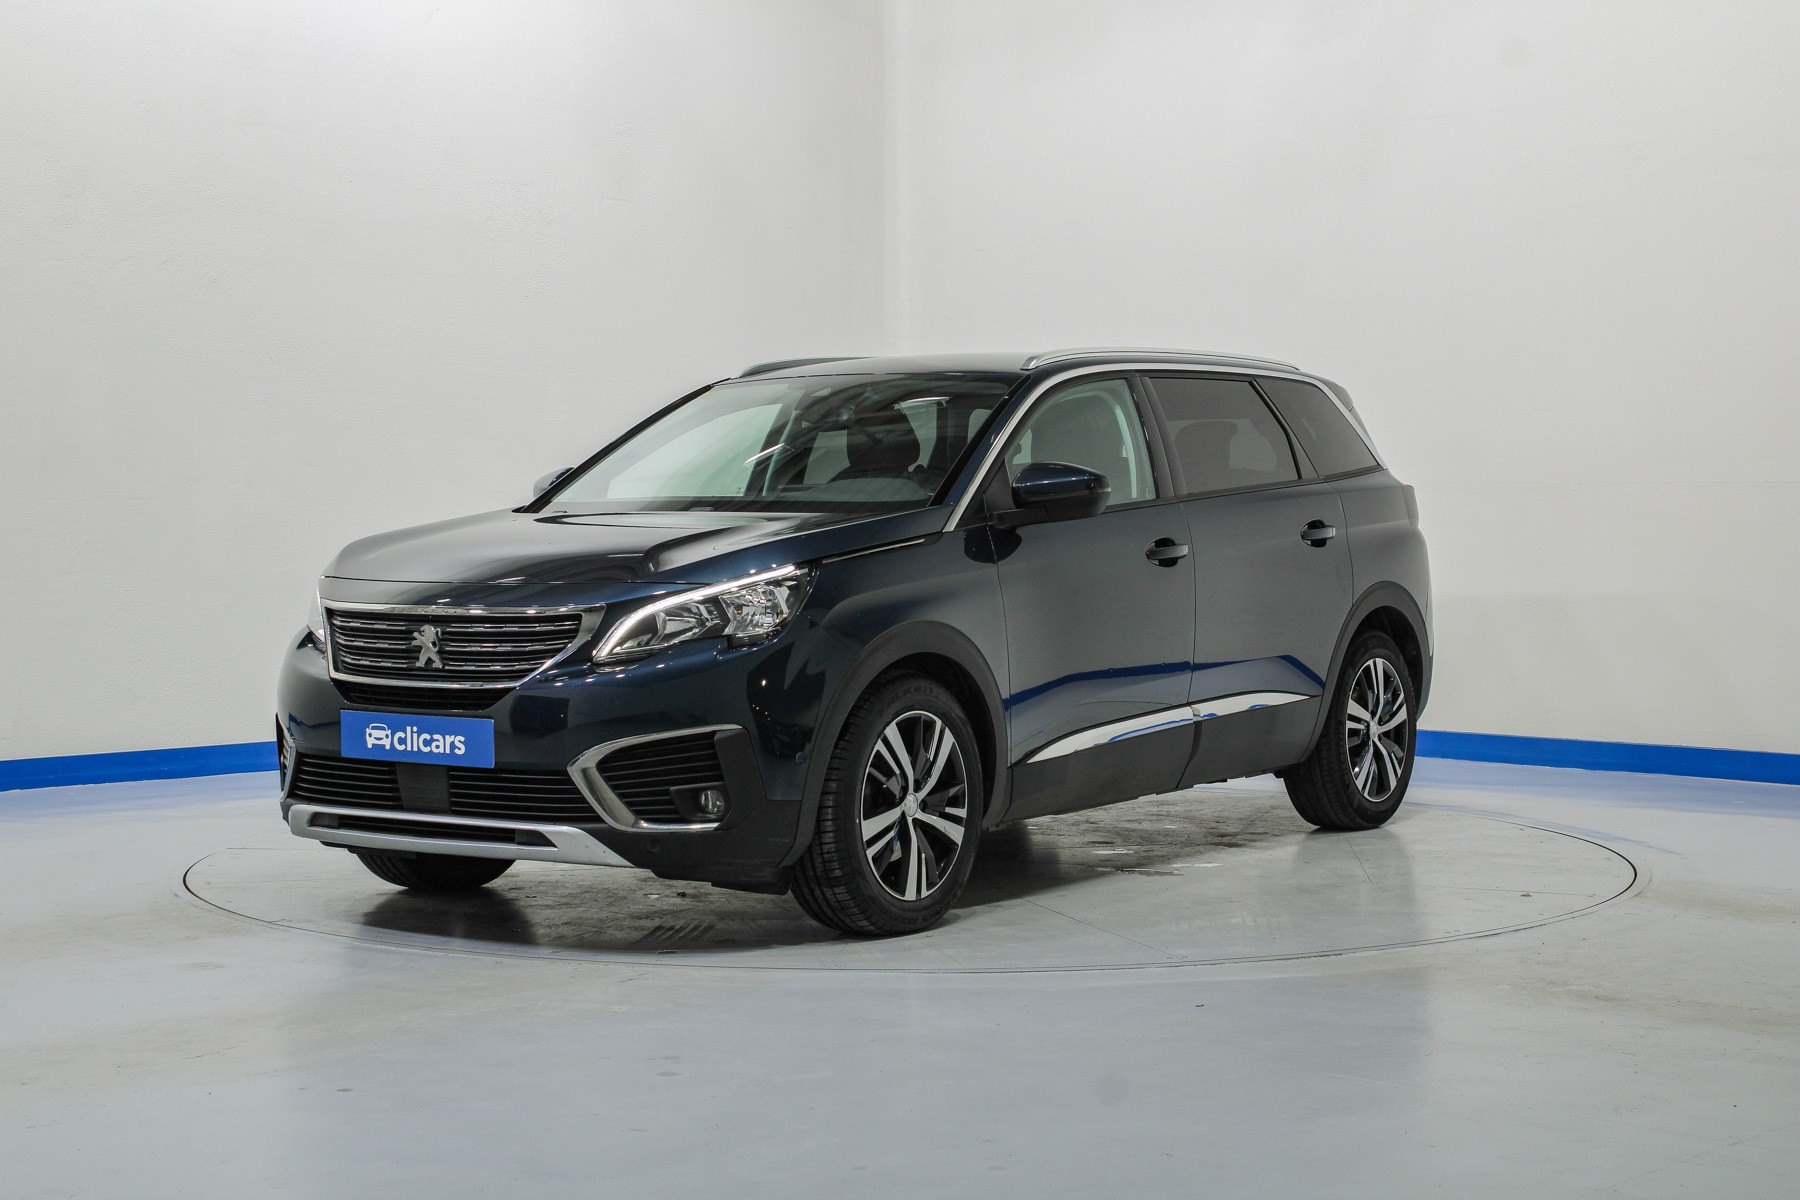 Peugeot 5008 Diésel Allure 1.6L BlueHDi 88kW(120CV) S&S EAT6 1